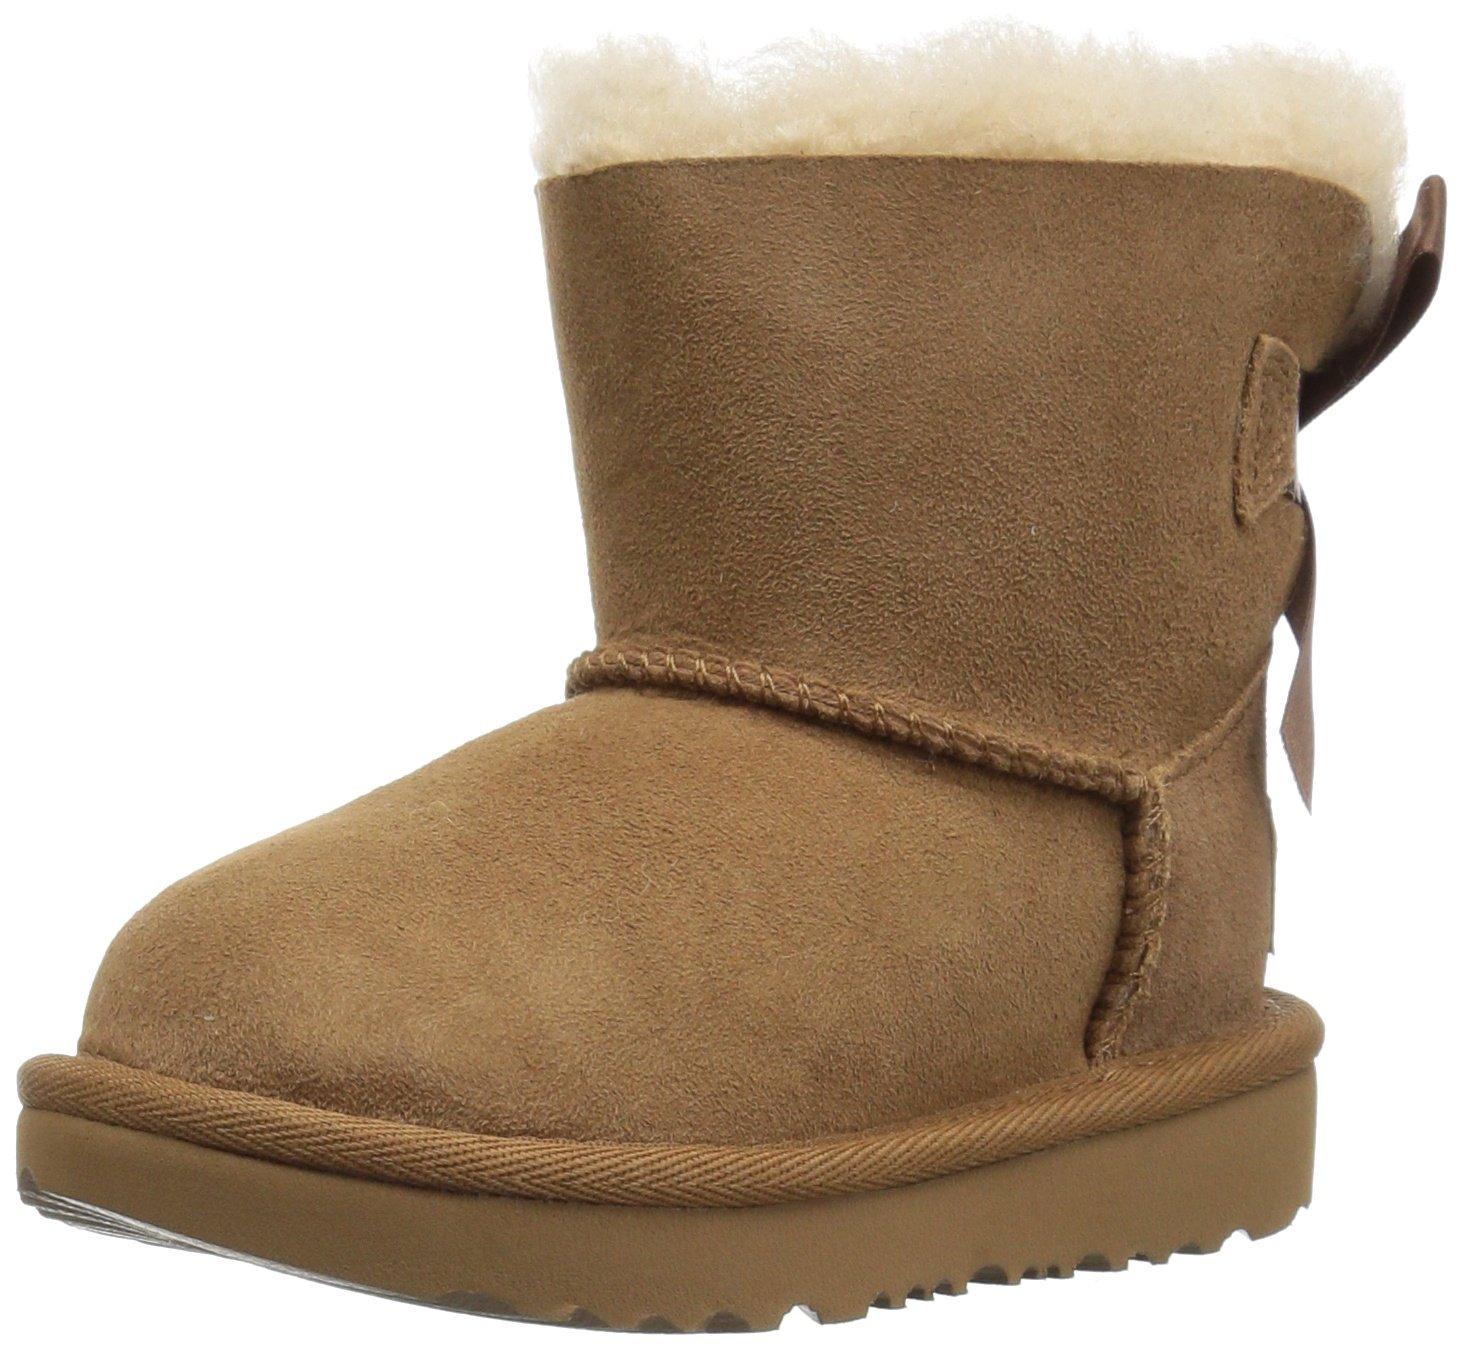 UGG Girls T Mini Bailey Bow II Pull-on Boot, Chestnut, 11 M US Little Kid